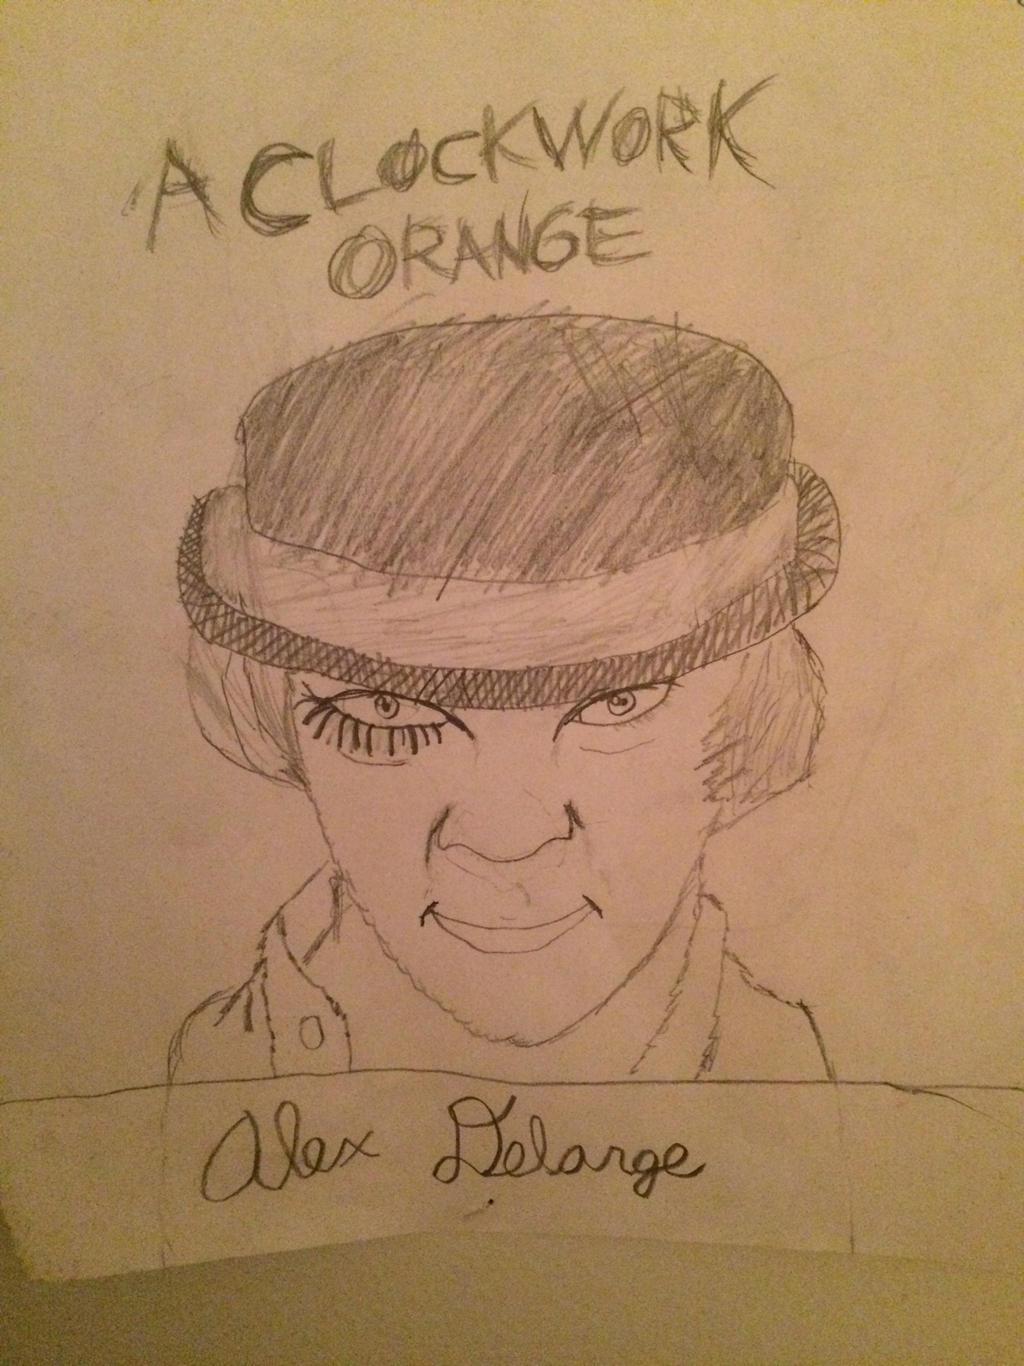 Alex from a clockwork orange pencil drawing by ramonian stones on